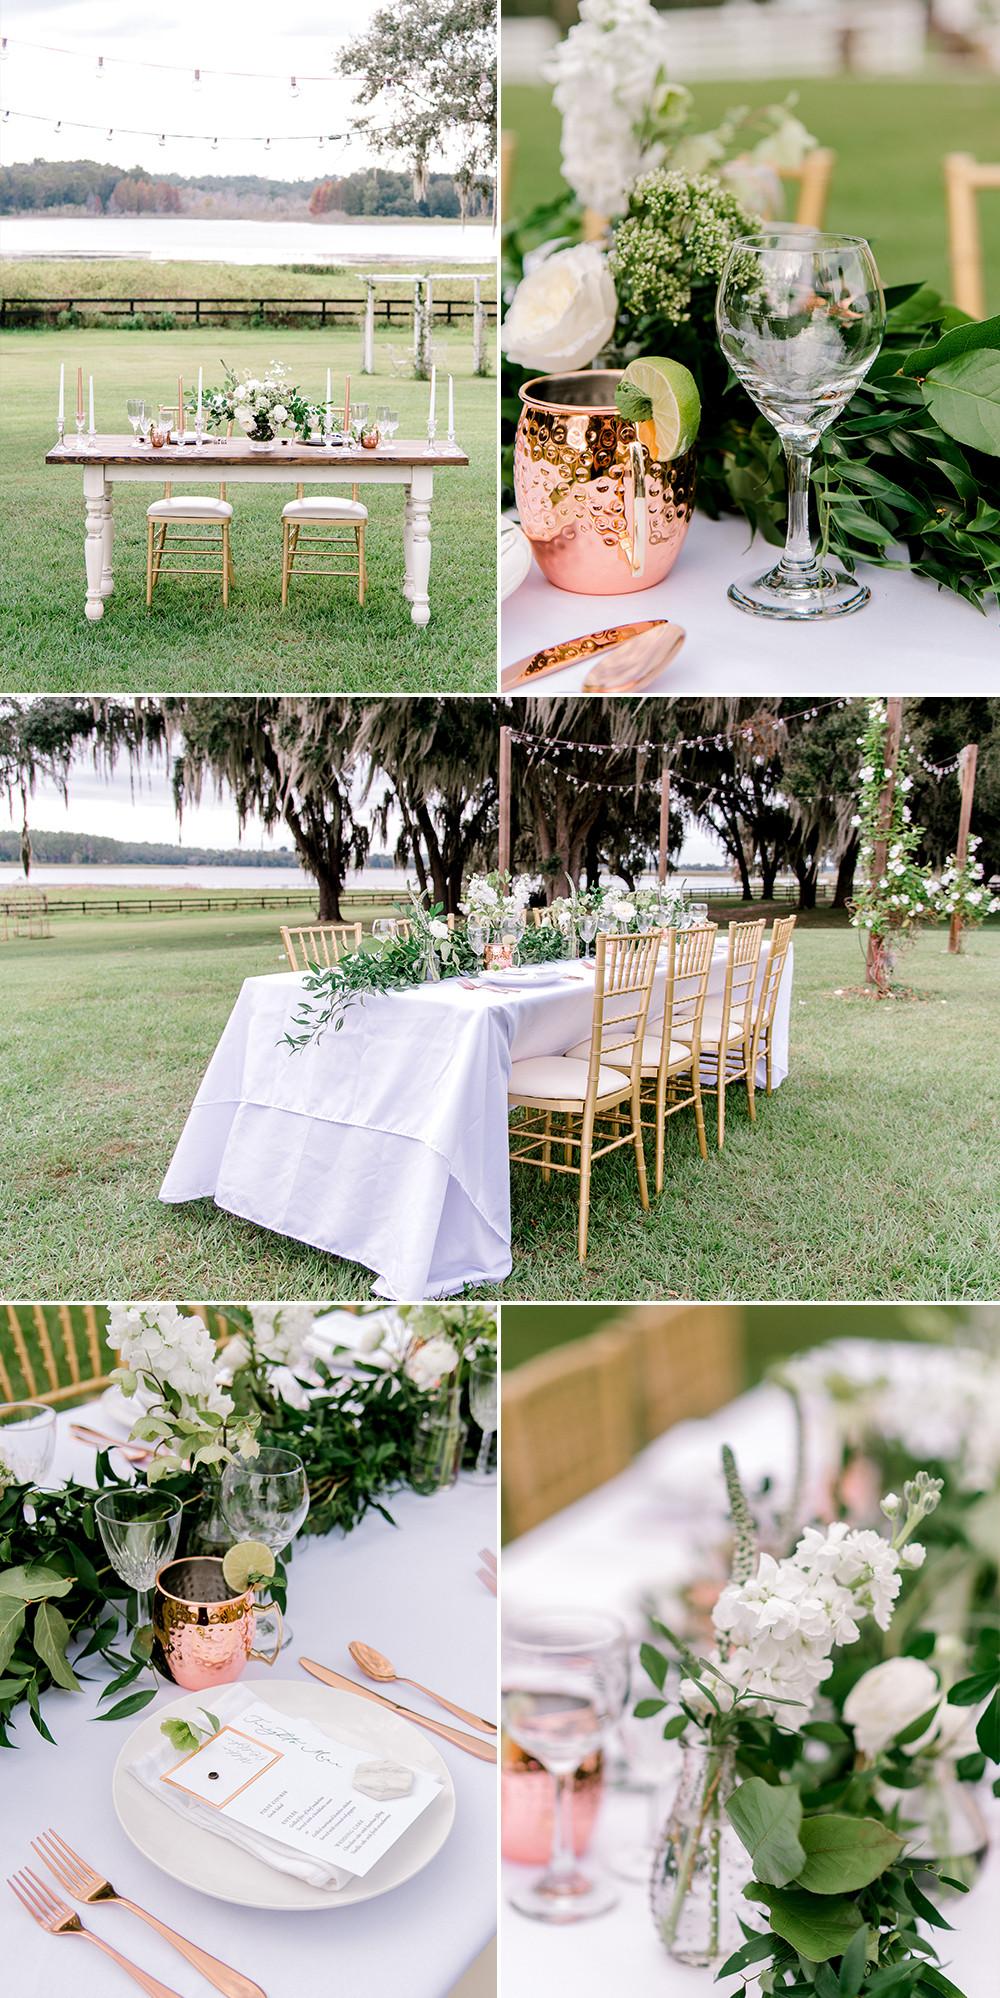 Nina Bashaw Photography - Tampa wedding photographer